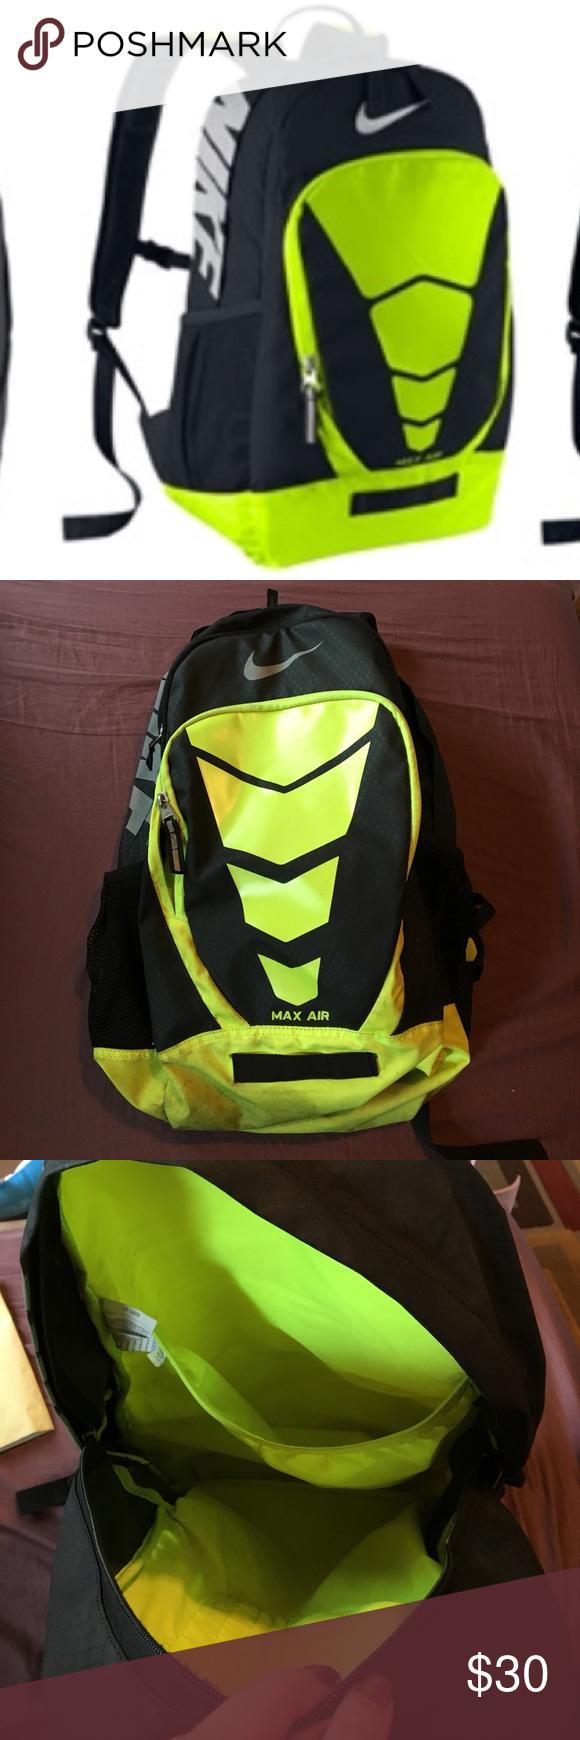 Neon Yellow Backpack Nike- Fenix Toulouse Handball 2f991fa16290d